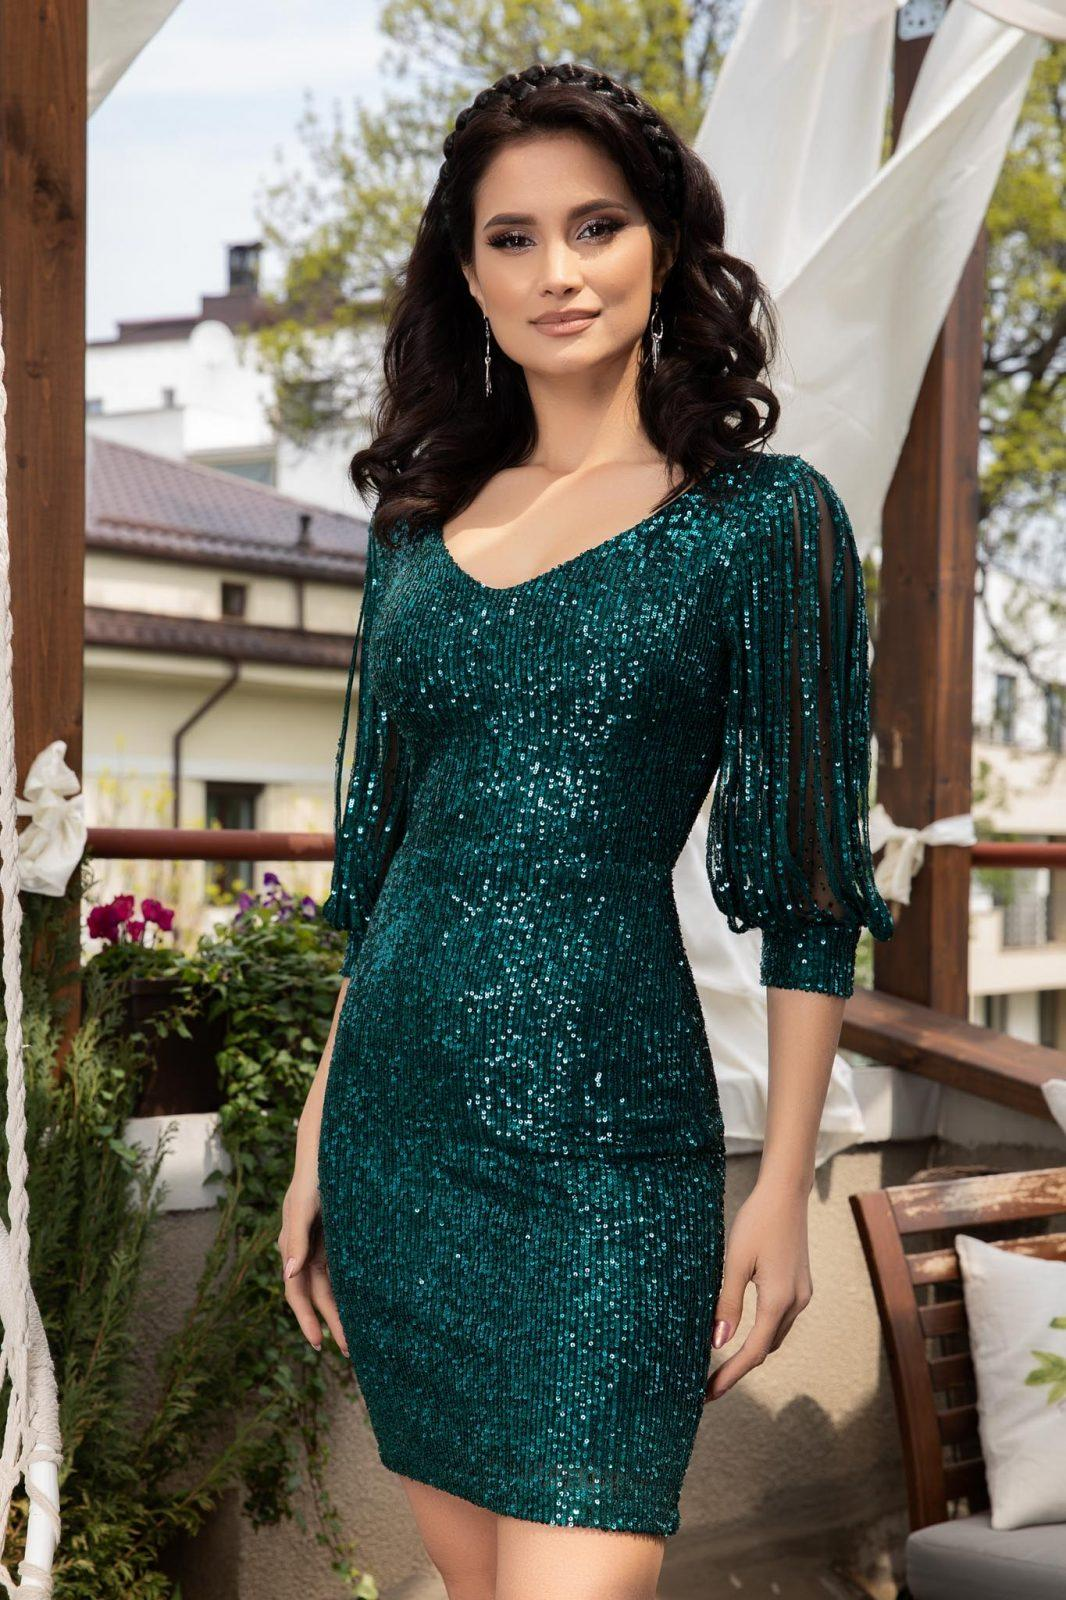 Katriss Πράσινο Φόρεμα 4594